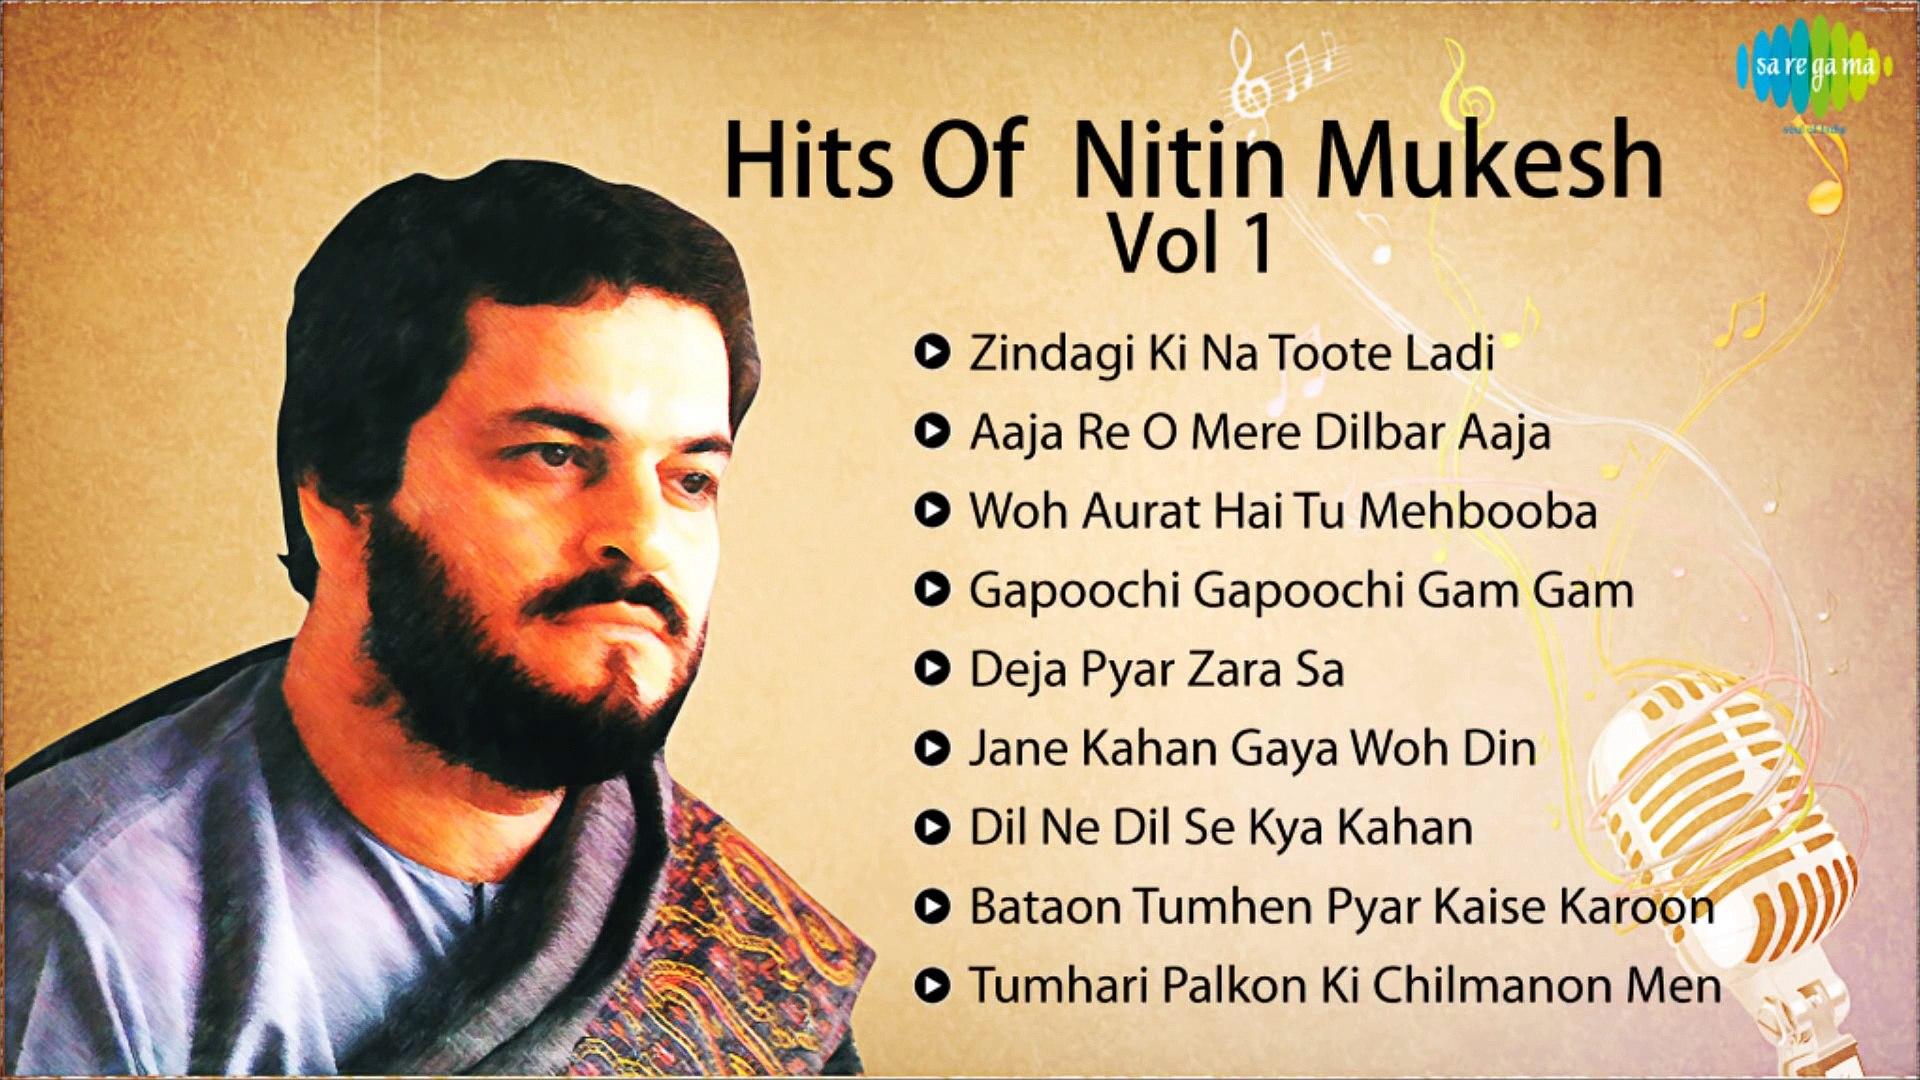 Film Hits Of Nitin Mukesh in HQ Audio